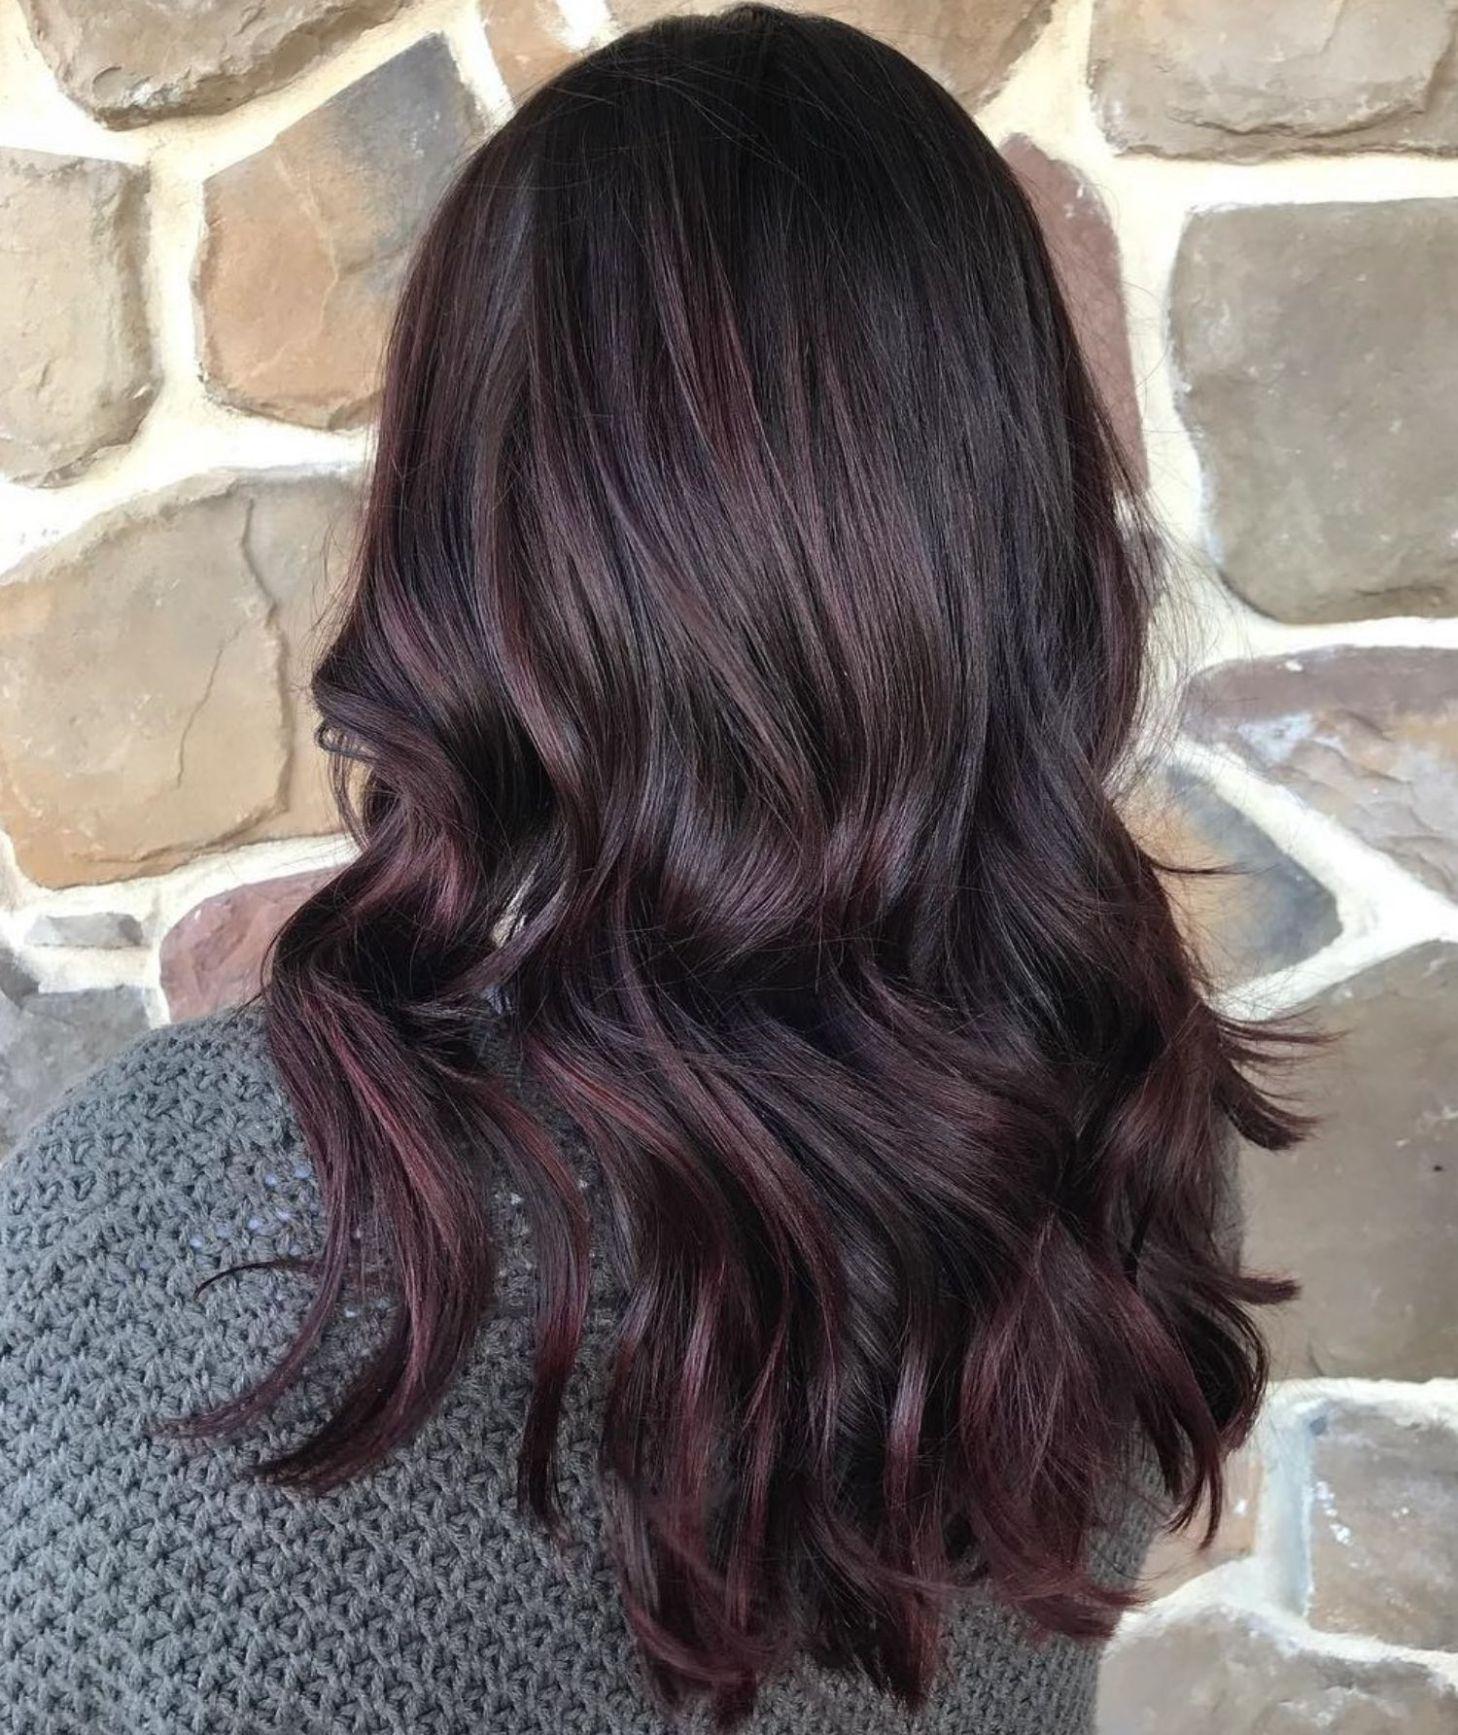 45 Shades Of Burgundy Hair Dark Burgundy Maroon Burgundy With Red Purple And Brown Highlights Hair Tint Burgundy Hair Hair Color Burgundy